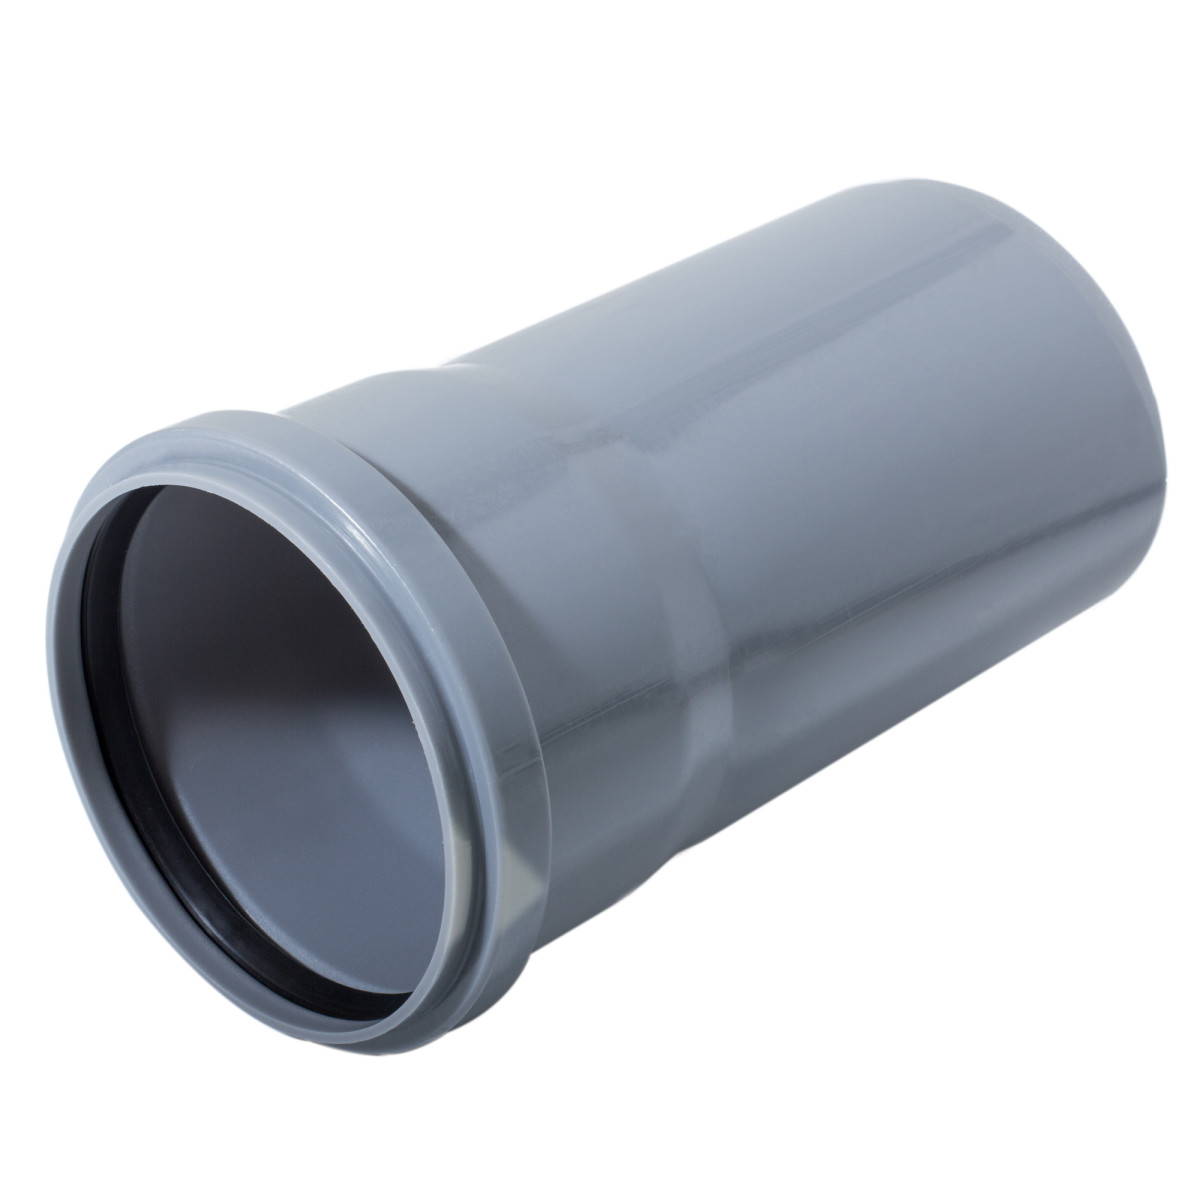 Труба канализационная Ø 110 мм L 2м полипропилен